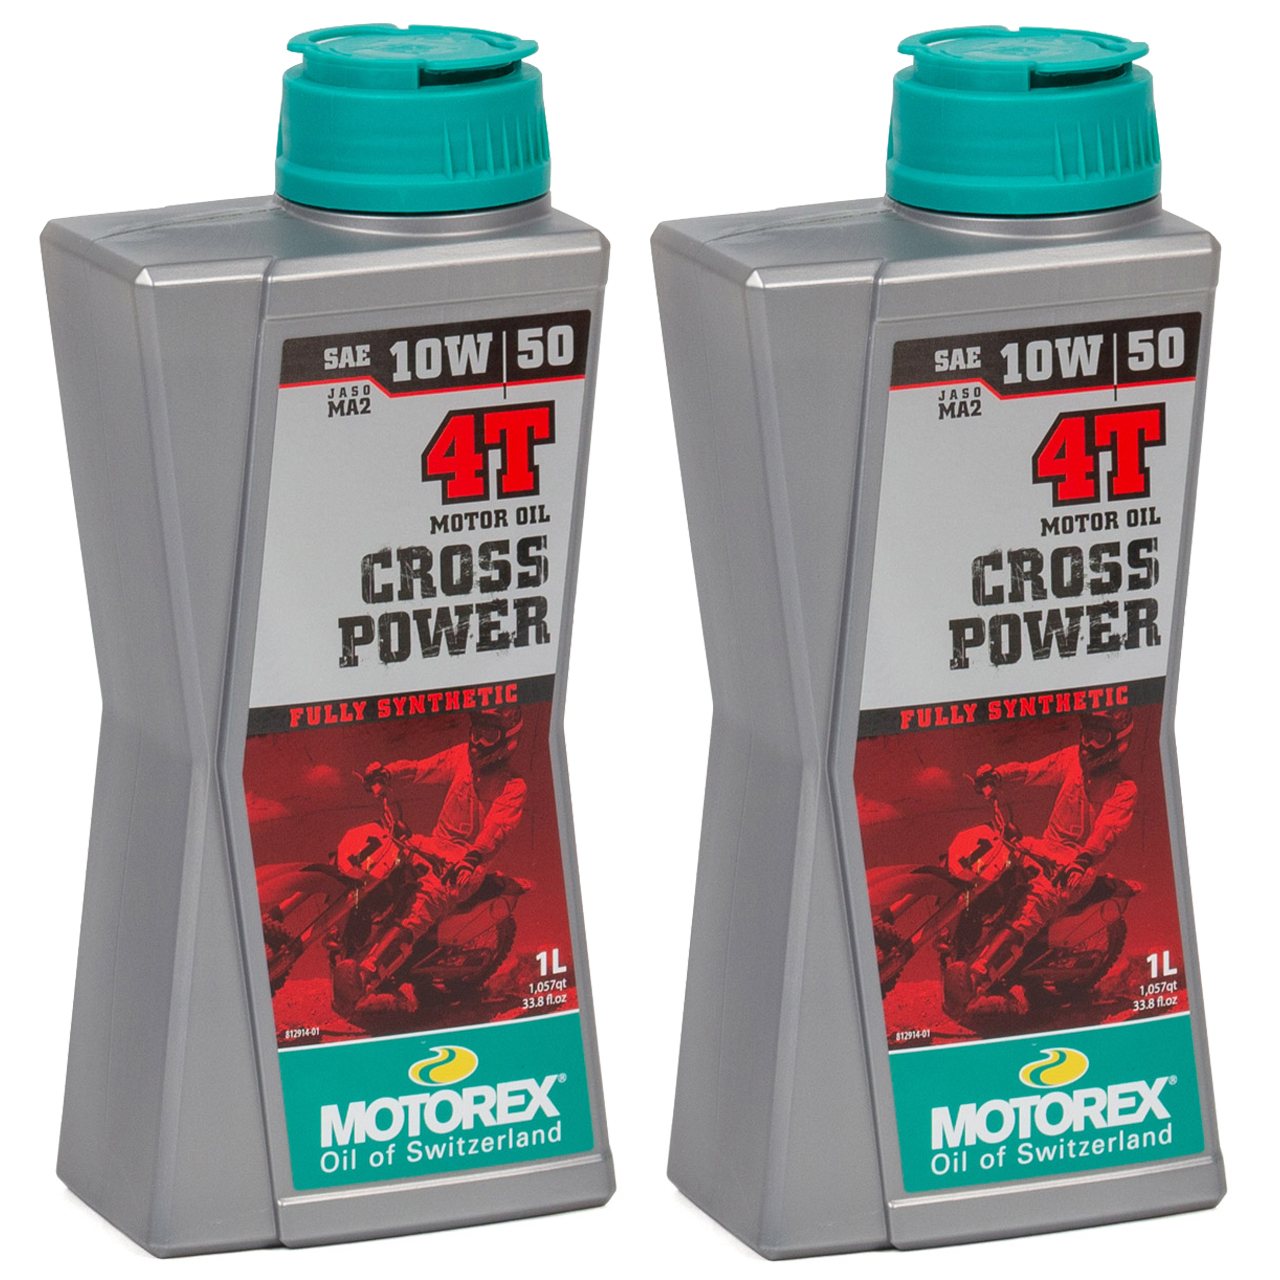 MOTOREX Cross Power 4T Motoröl Öl 10W50 JASO MA2 API SN/SM/SL - 2L 2 Liter